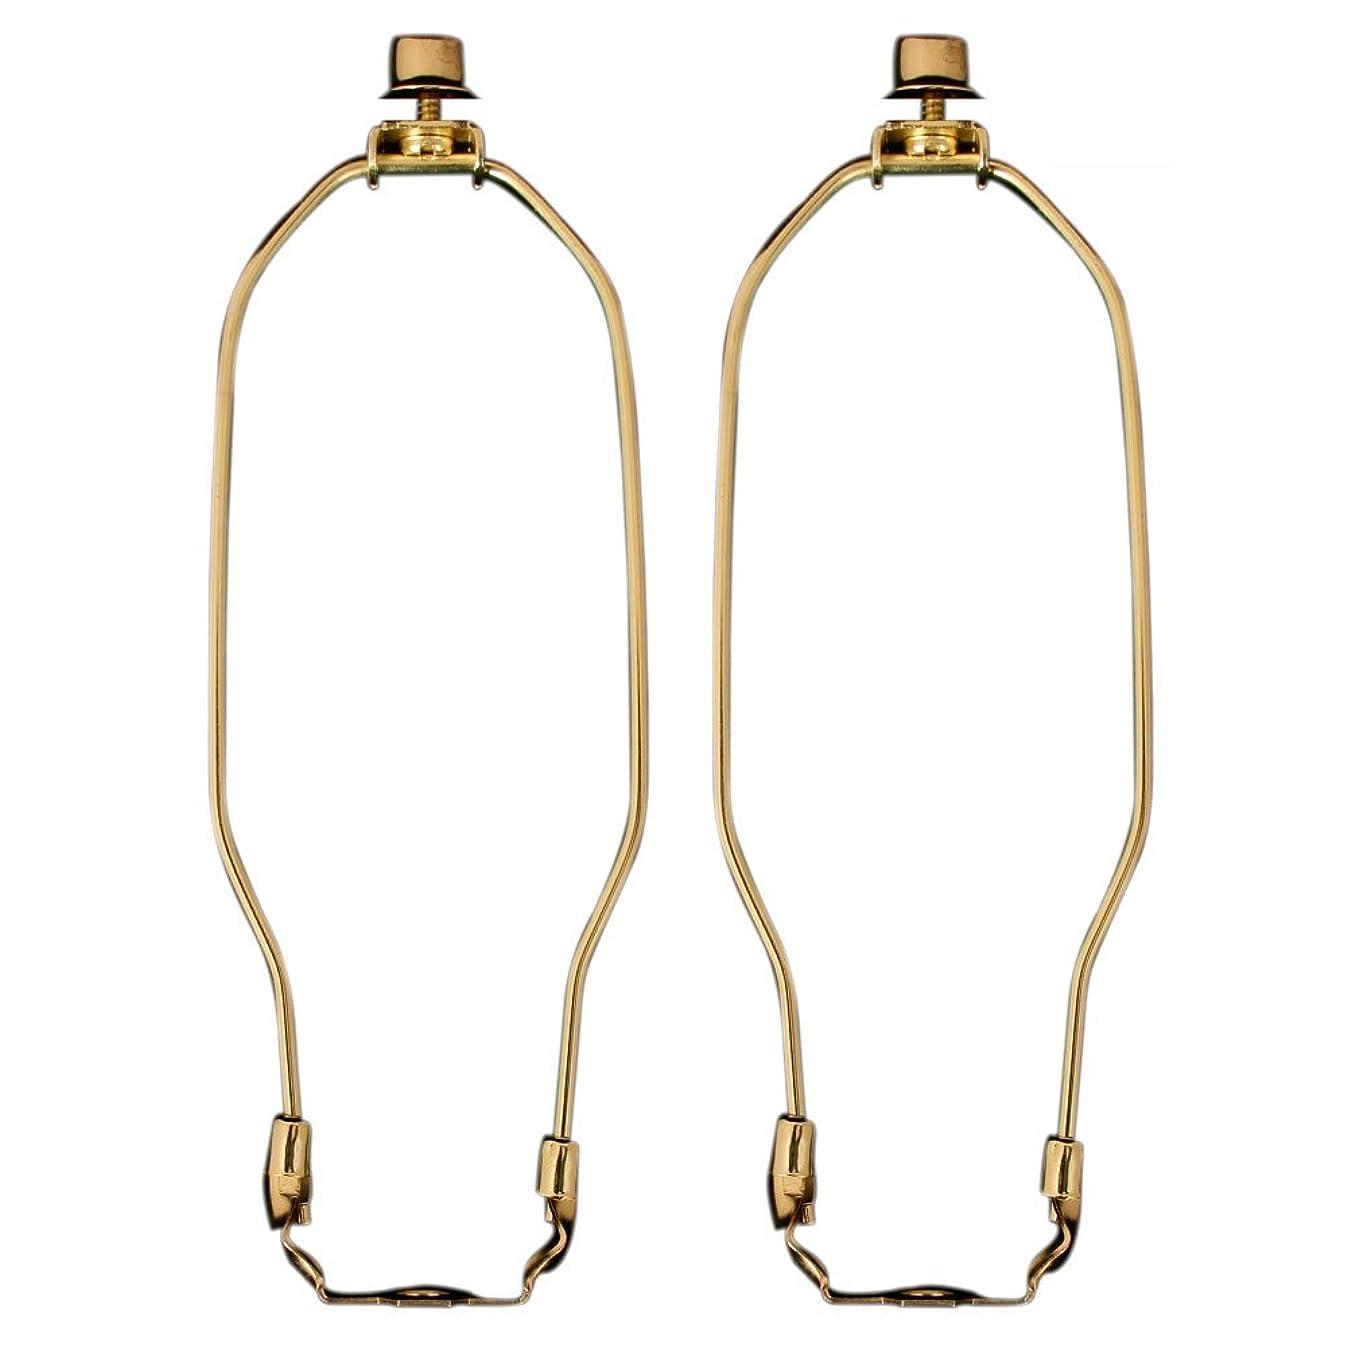 Royal Designs HA-1001-12BR-2 Heavy Duty Lamp Harp, 12